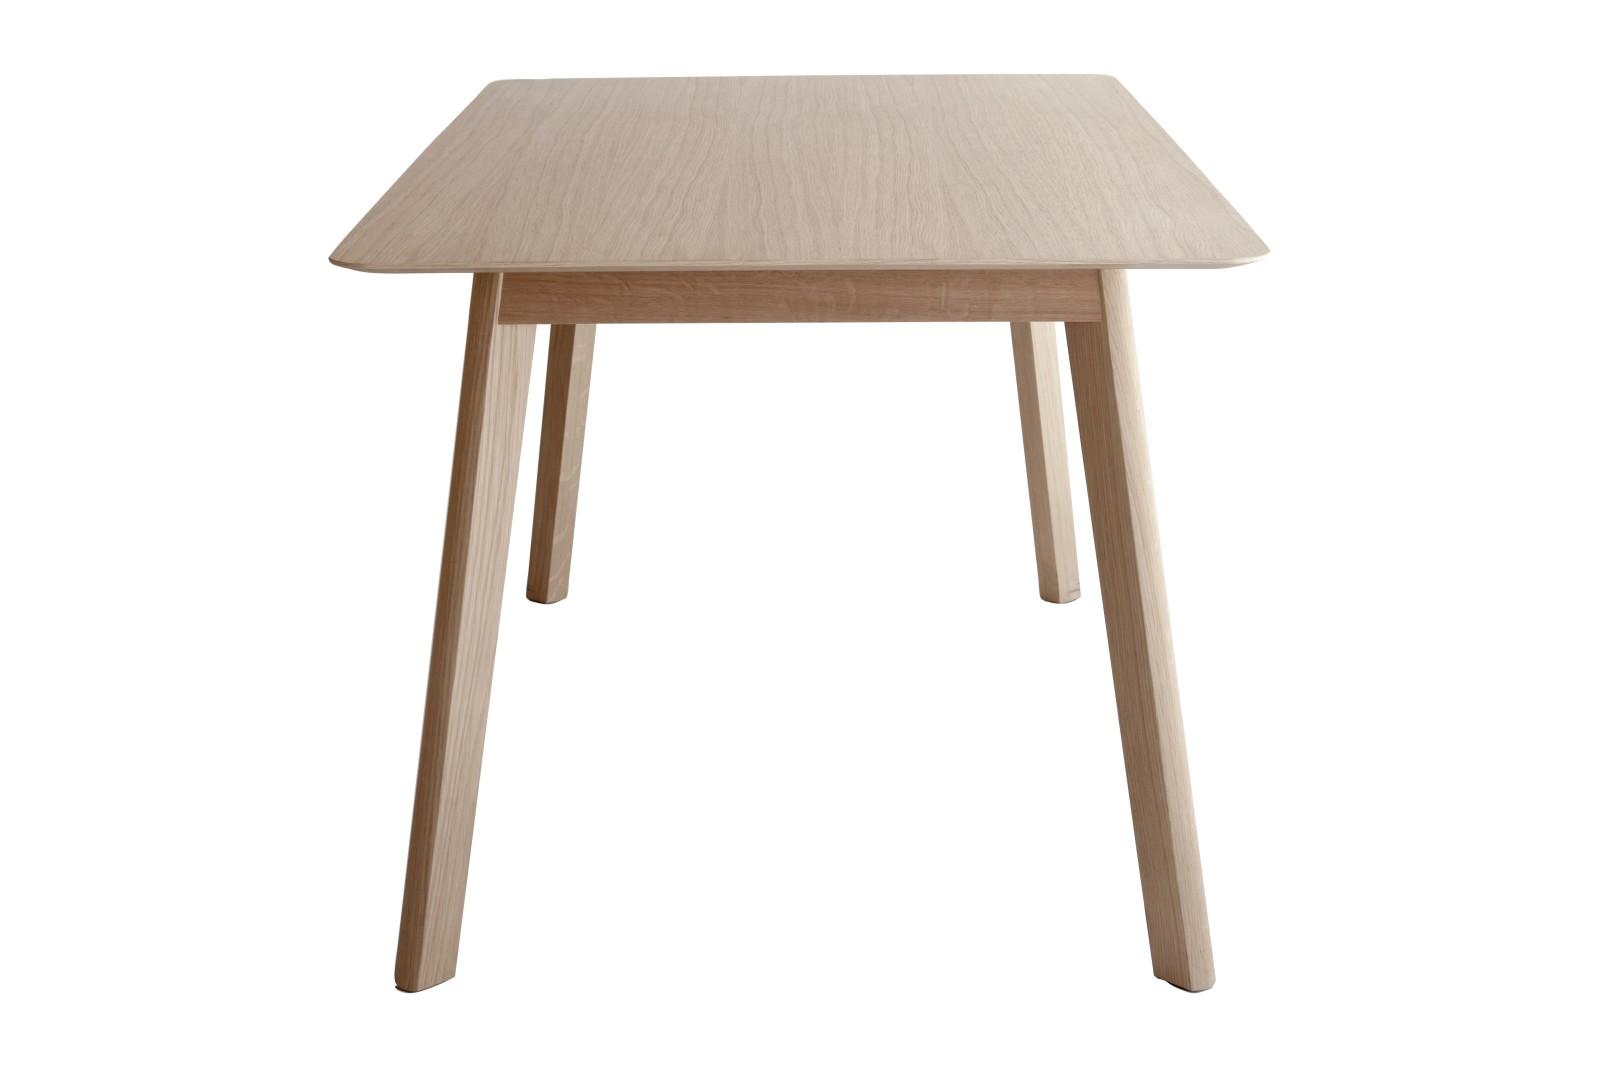 Transalpina Dining Table, Non-extendable Super-Matt Oak, 140cm